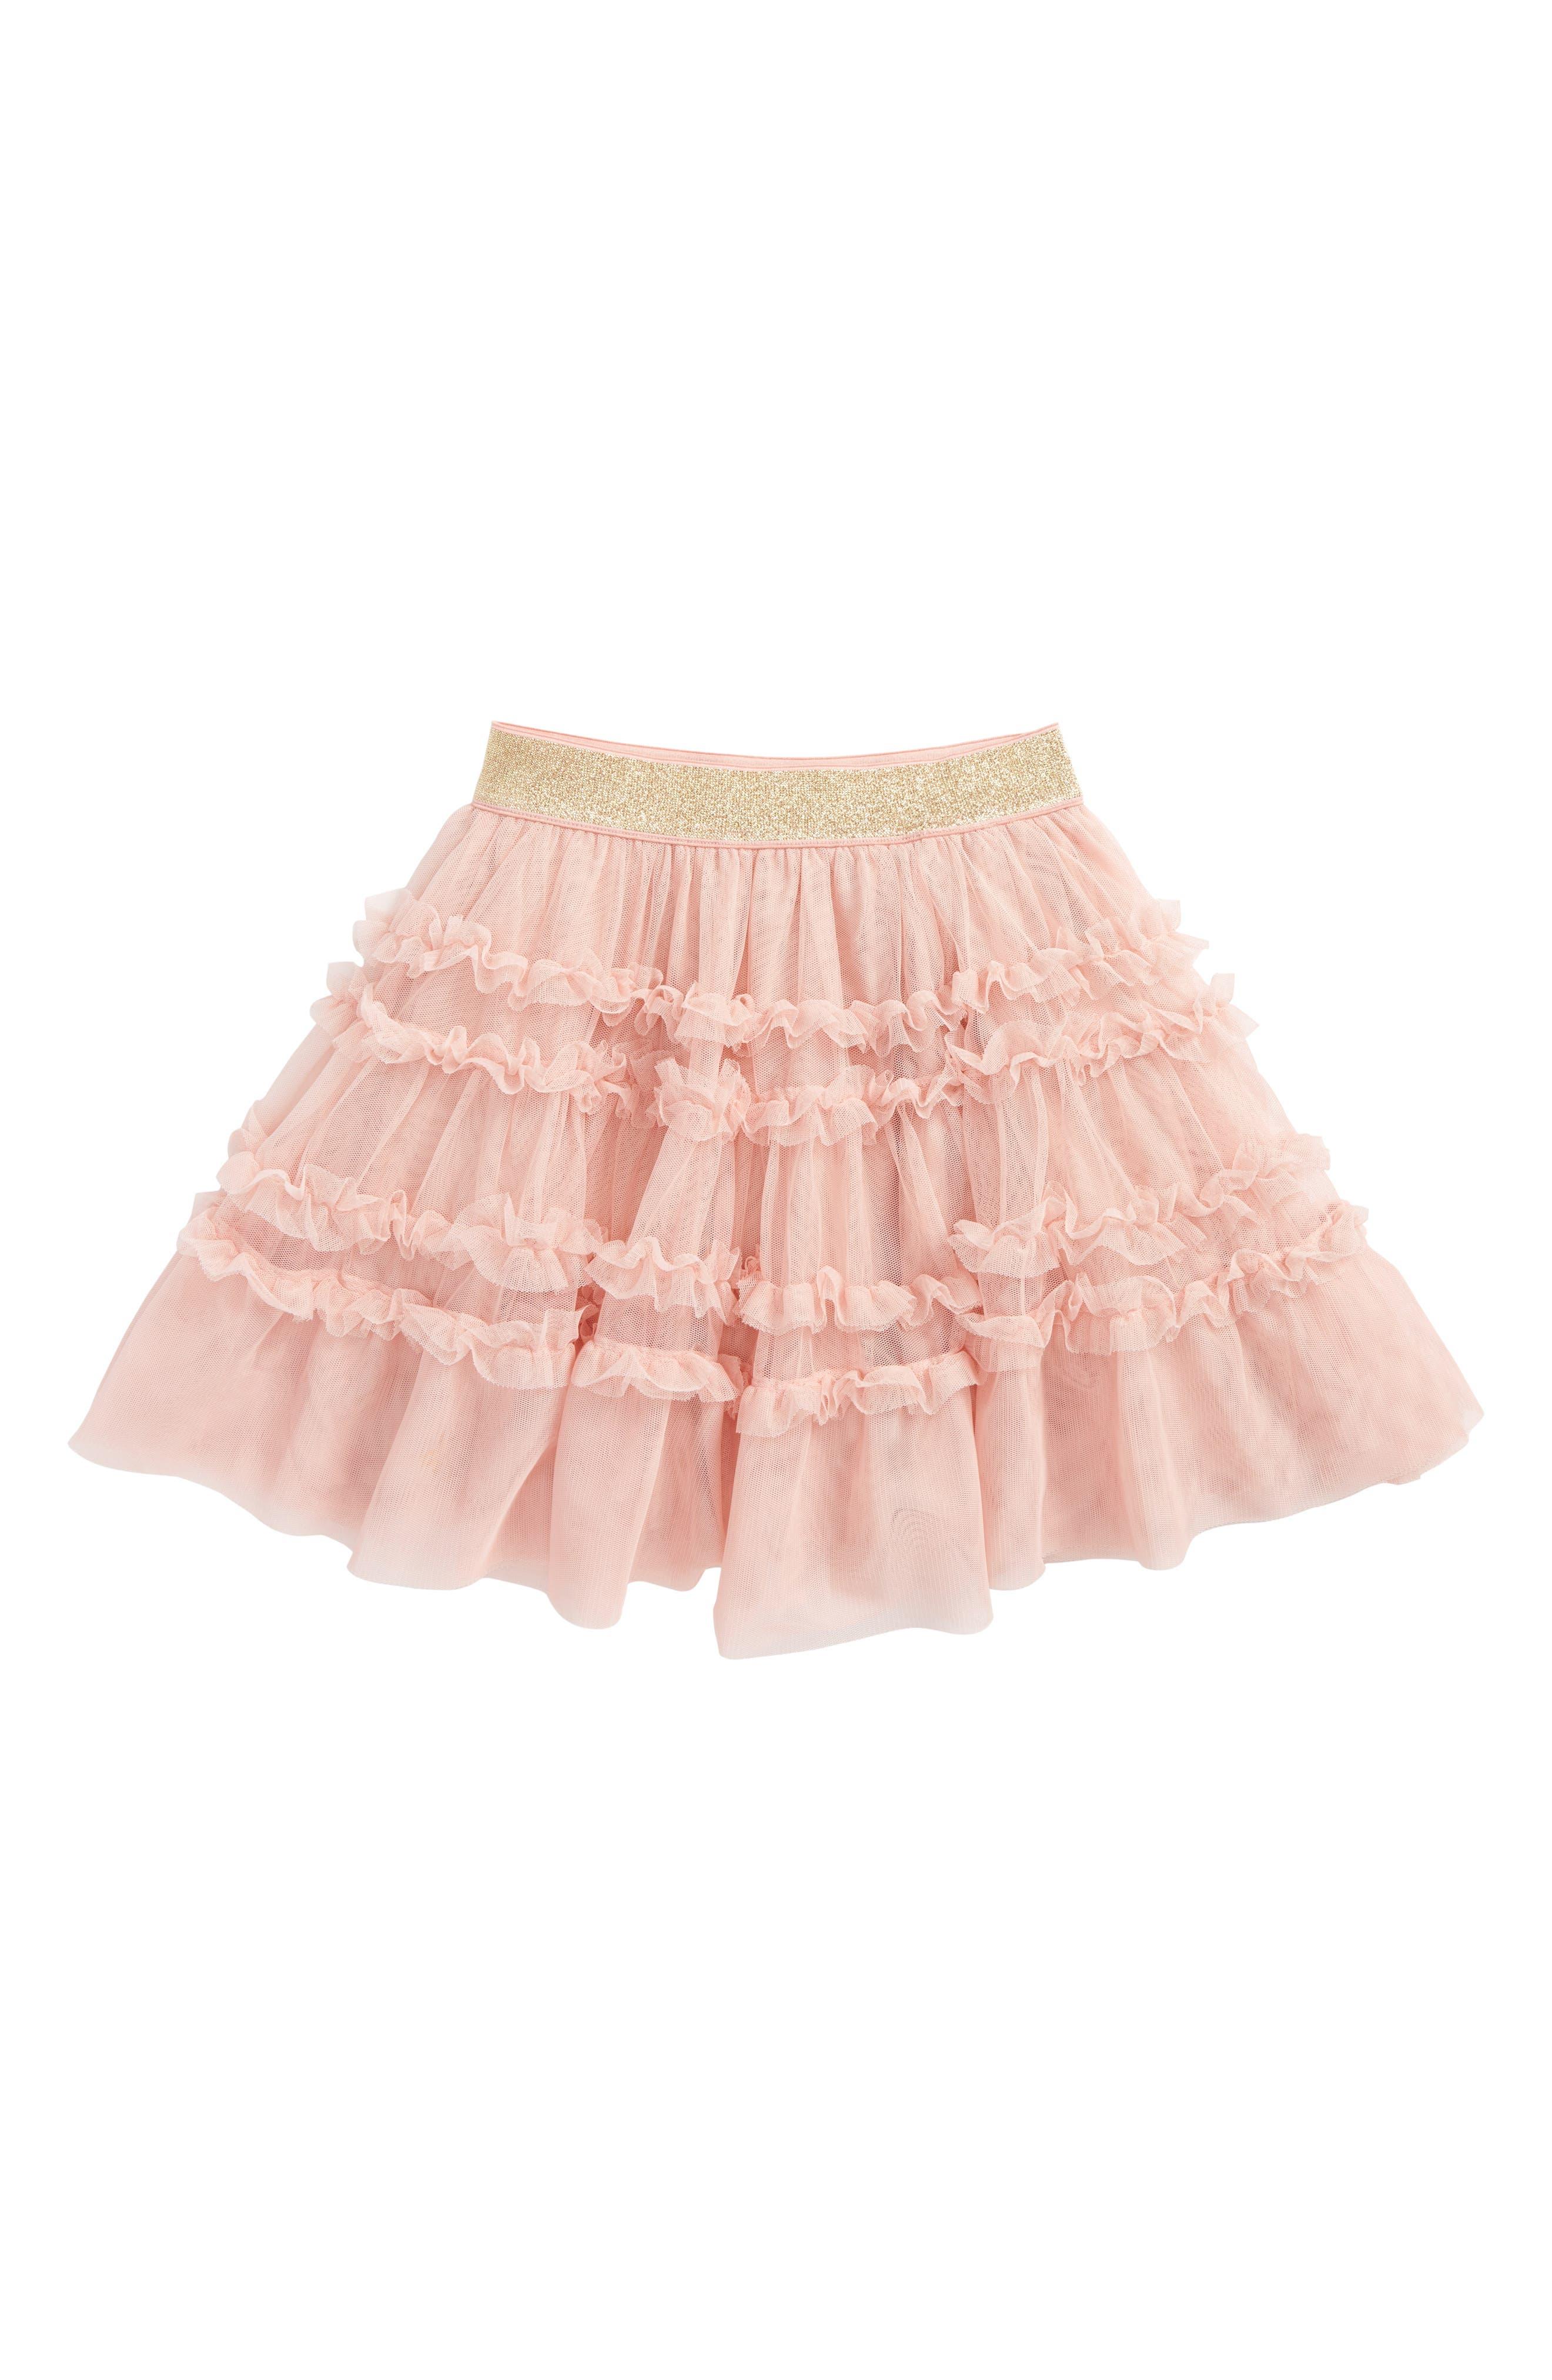 Ruffle Tulle Skirt,                         Main,                         color, 664